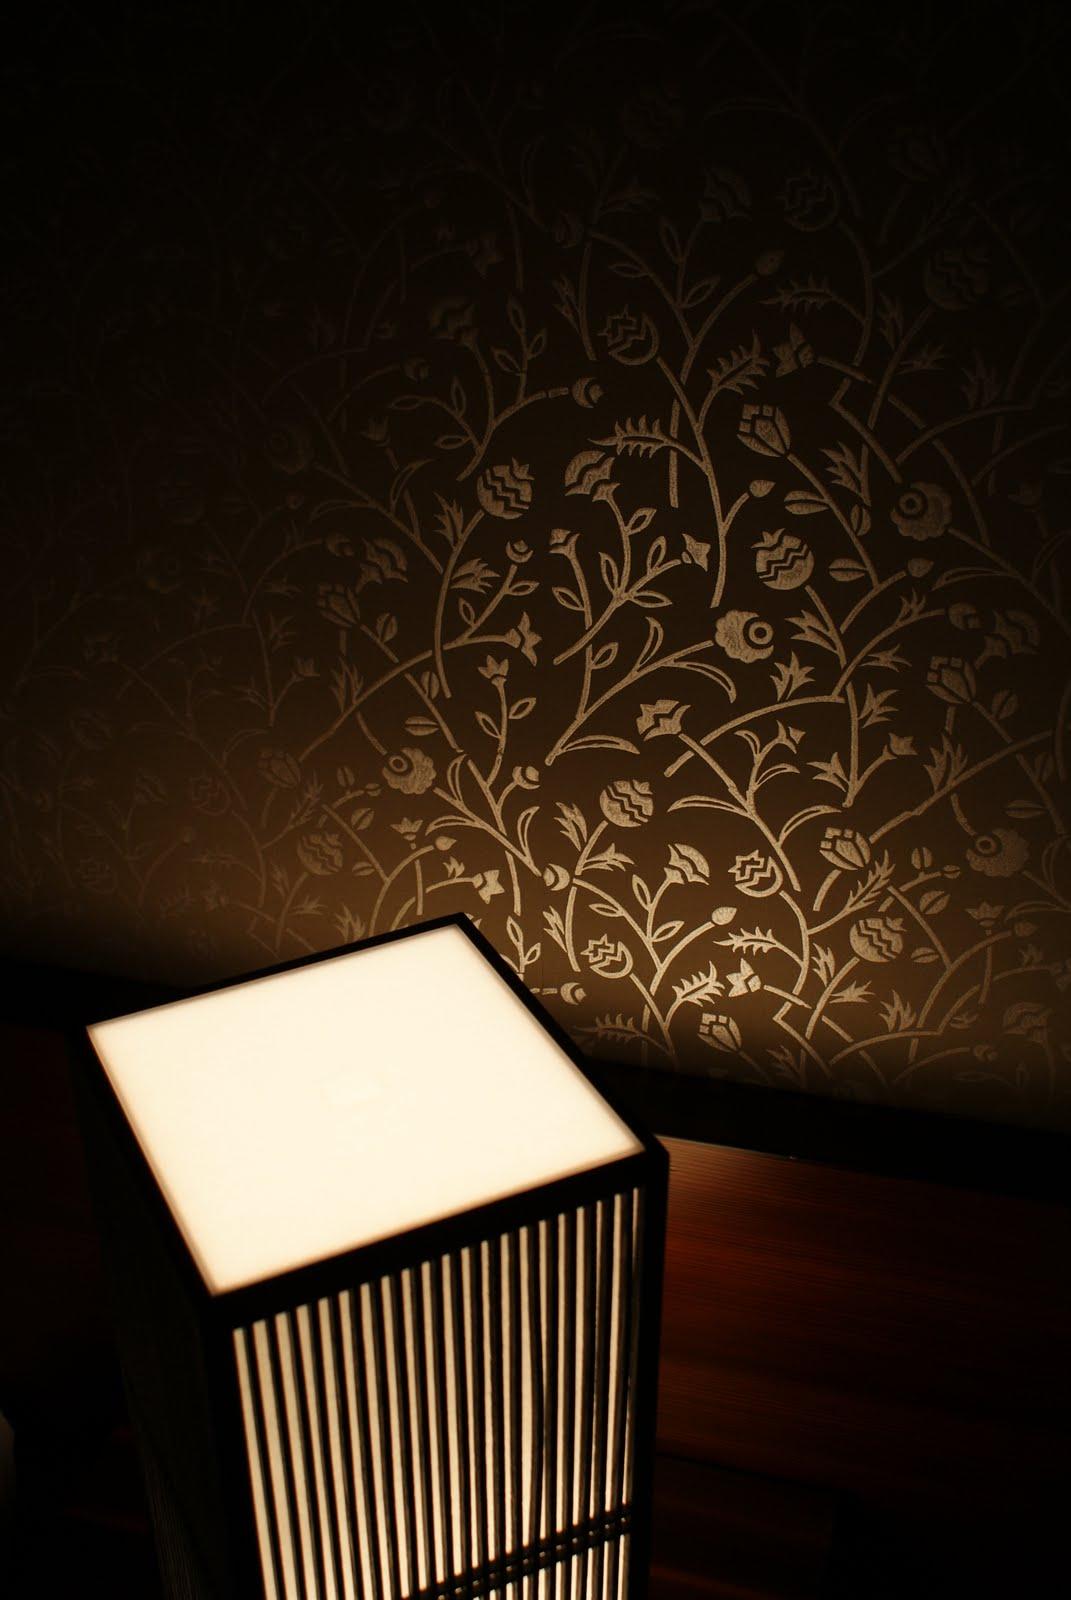 http://3.bp.blogspot.com/_pr73wCue53o/TRyKUBvoleI/AAAAAAAAAsQ/U2VMnt6Nes4/s1600/lampnwallpaper.JPG